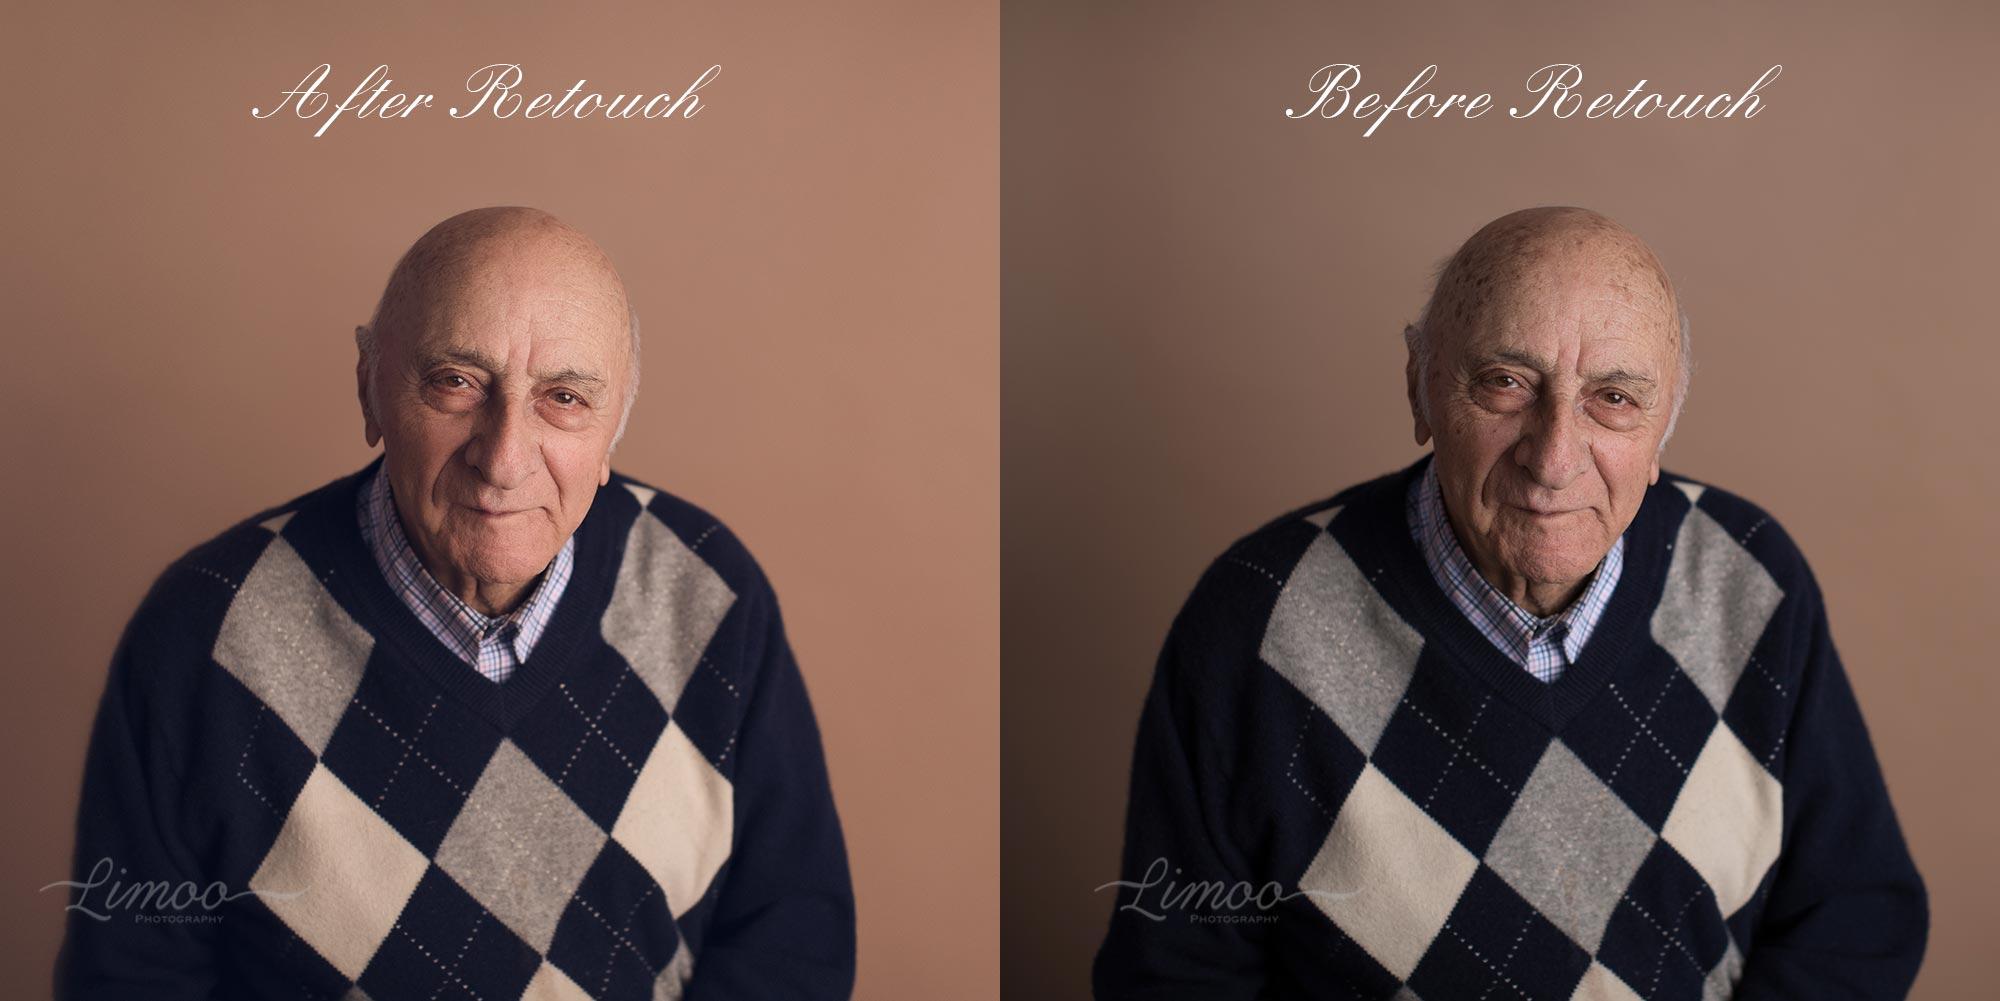 LimooPhotography-Portraitor-5